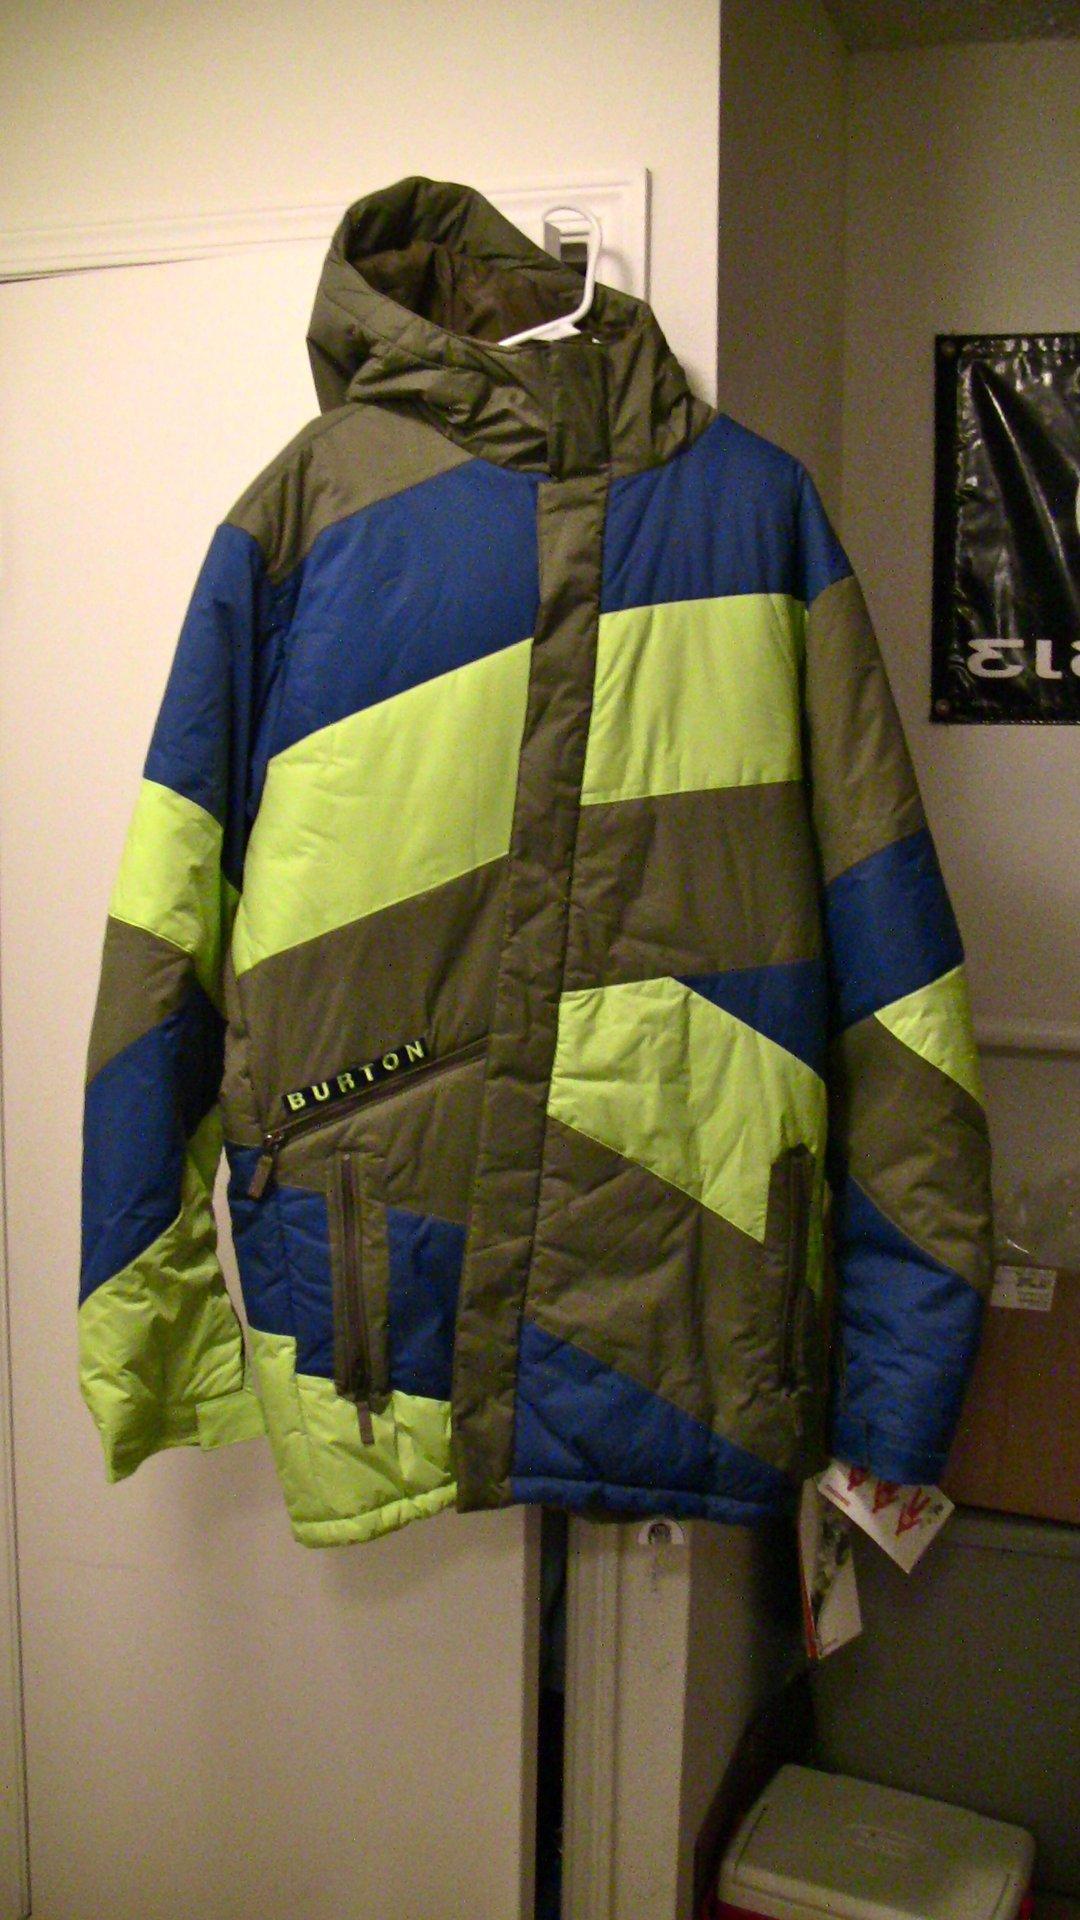 Burton Defender Jacket